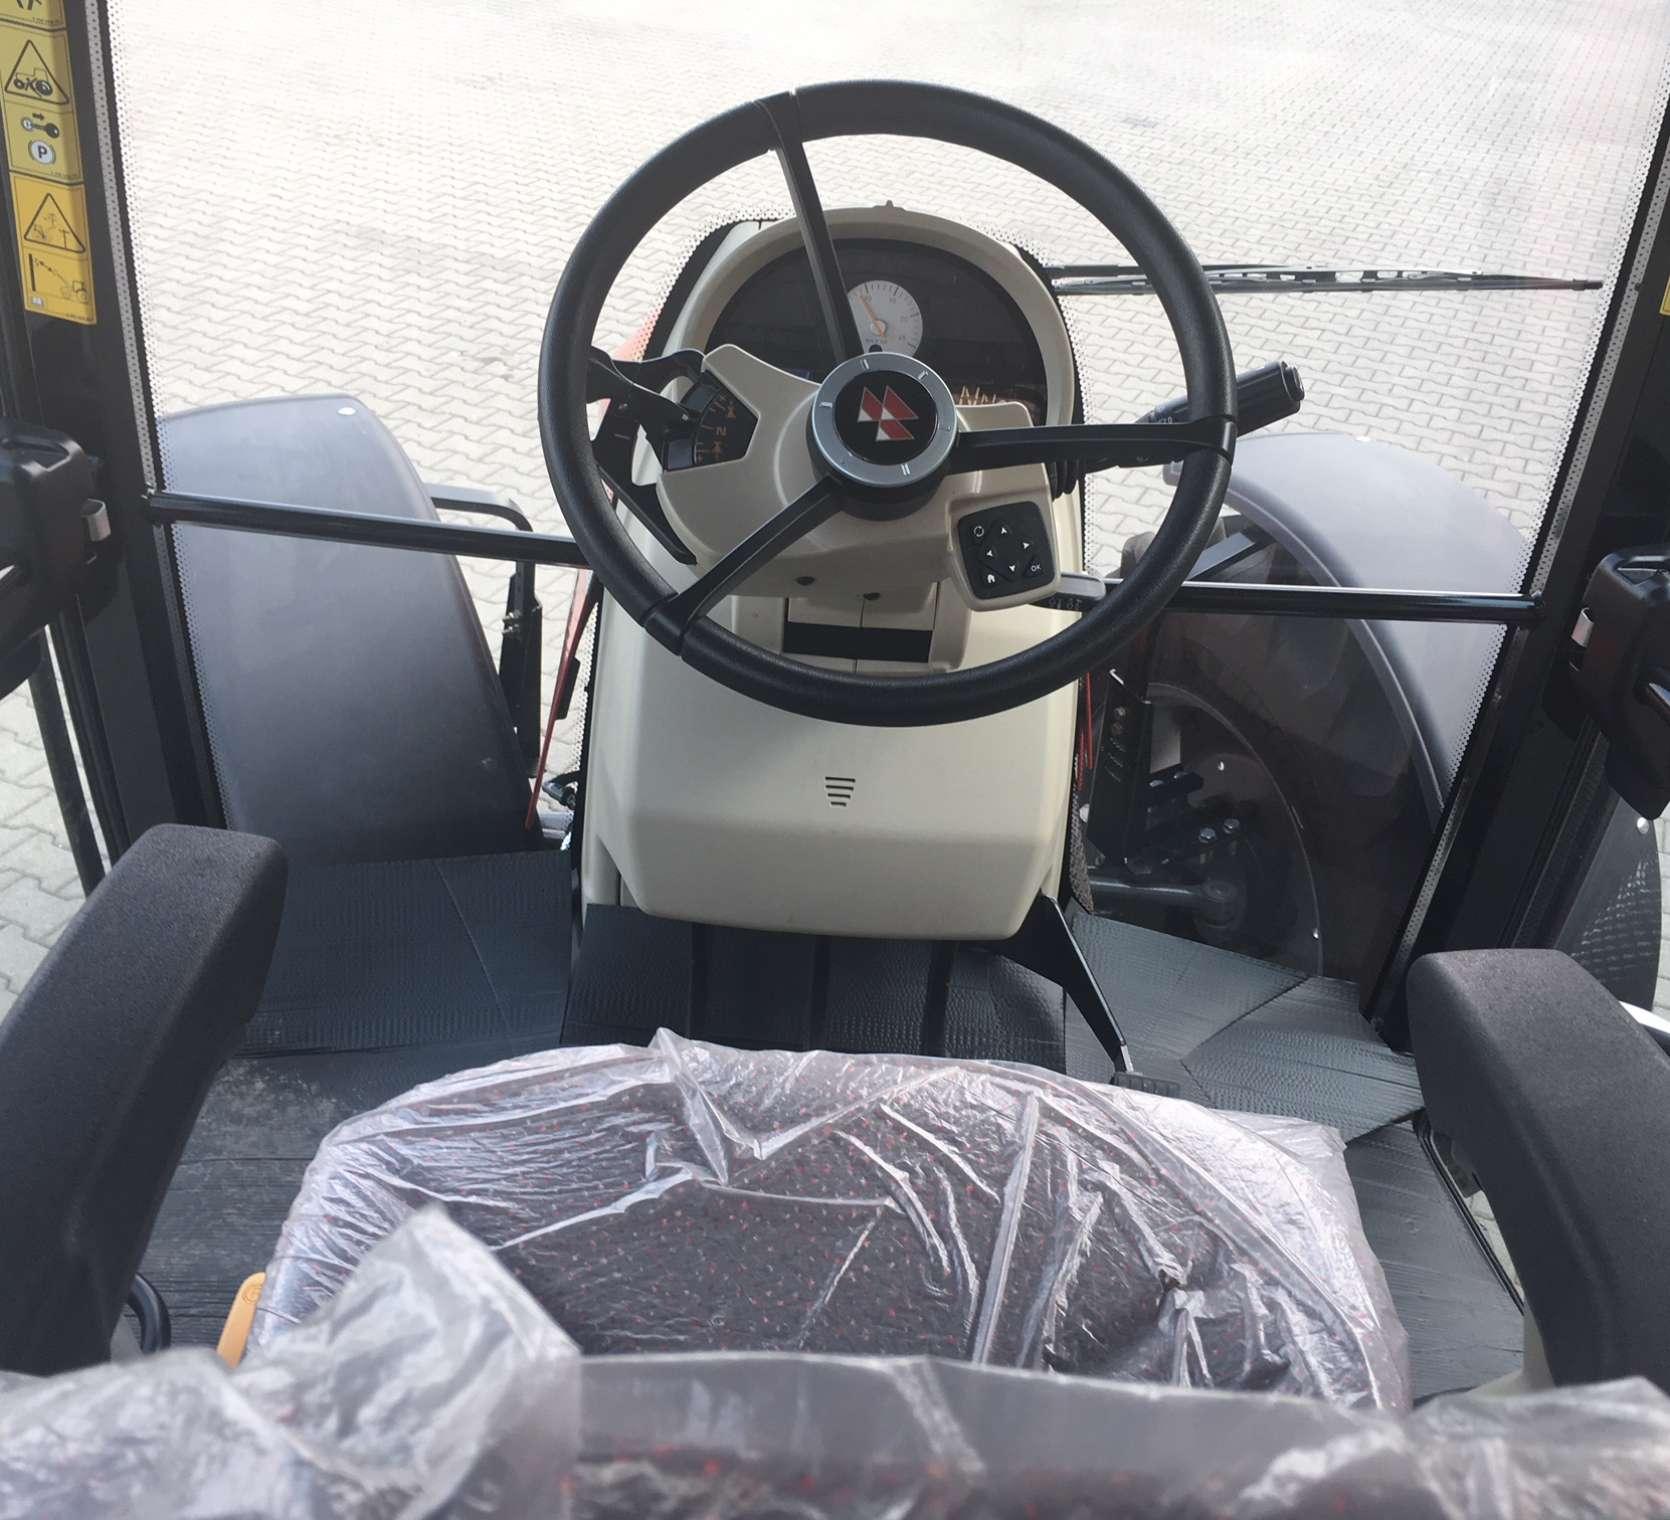 Regulowana kolumna kierownicy fotel operatora we wnętrzu kabiny traktora MF model 5613